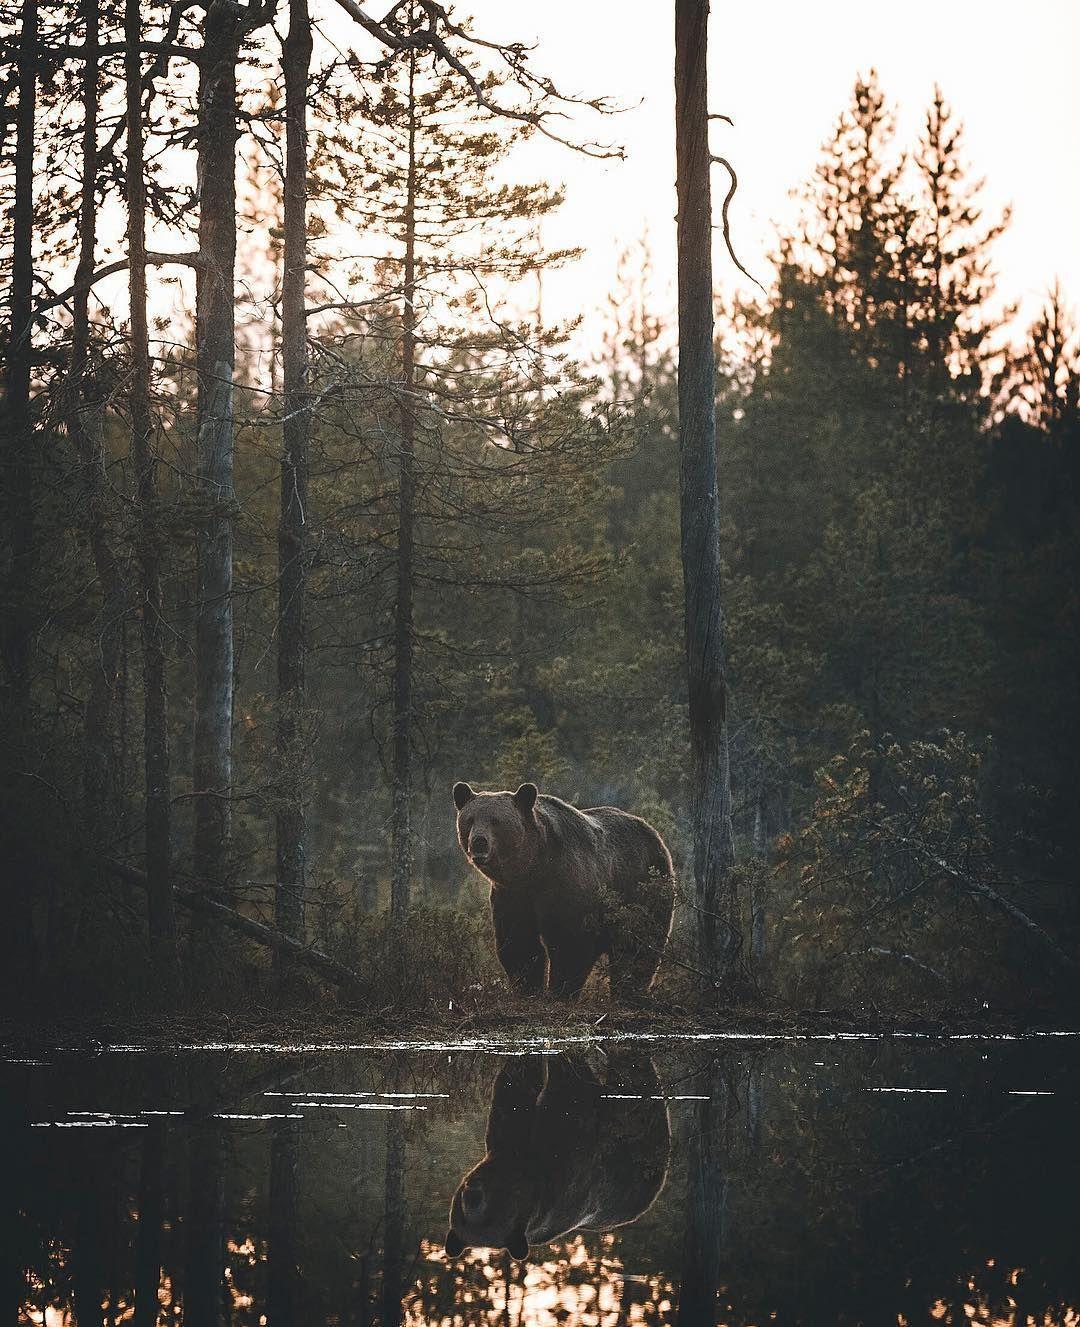 Magical moment from the deep Finnish Wilderness ✨ . . . . . #moodygrams #artofvisuals #wildernessculture #beautifuldestinations #artofvisuals #exploretocreate #earthofficial #finland #conservation #wildlife